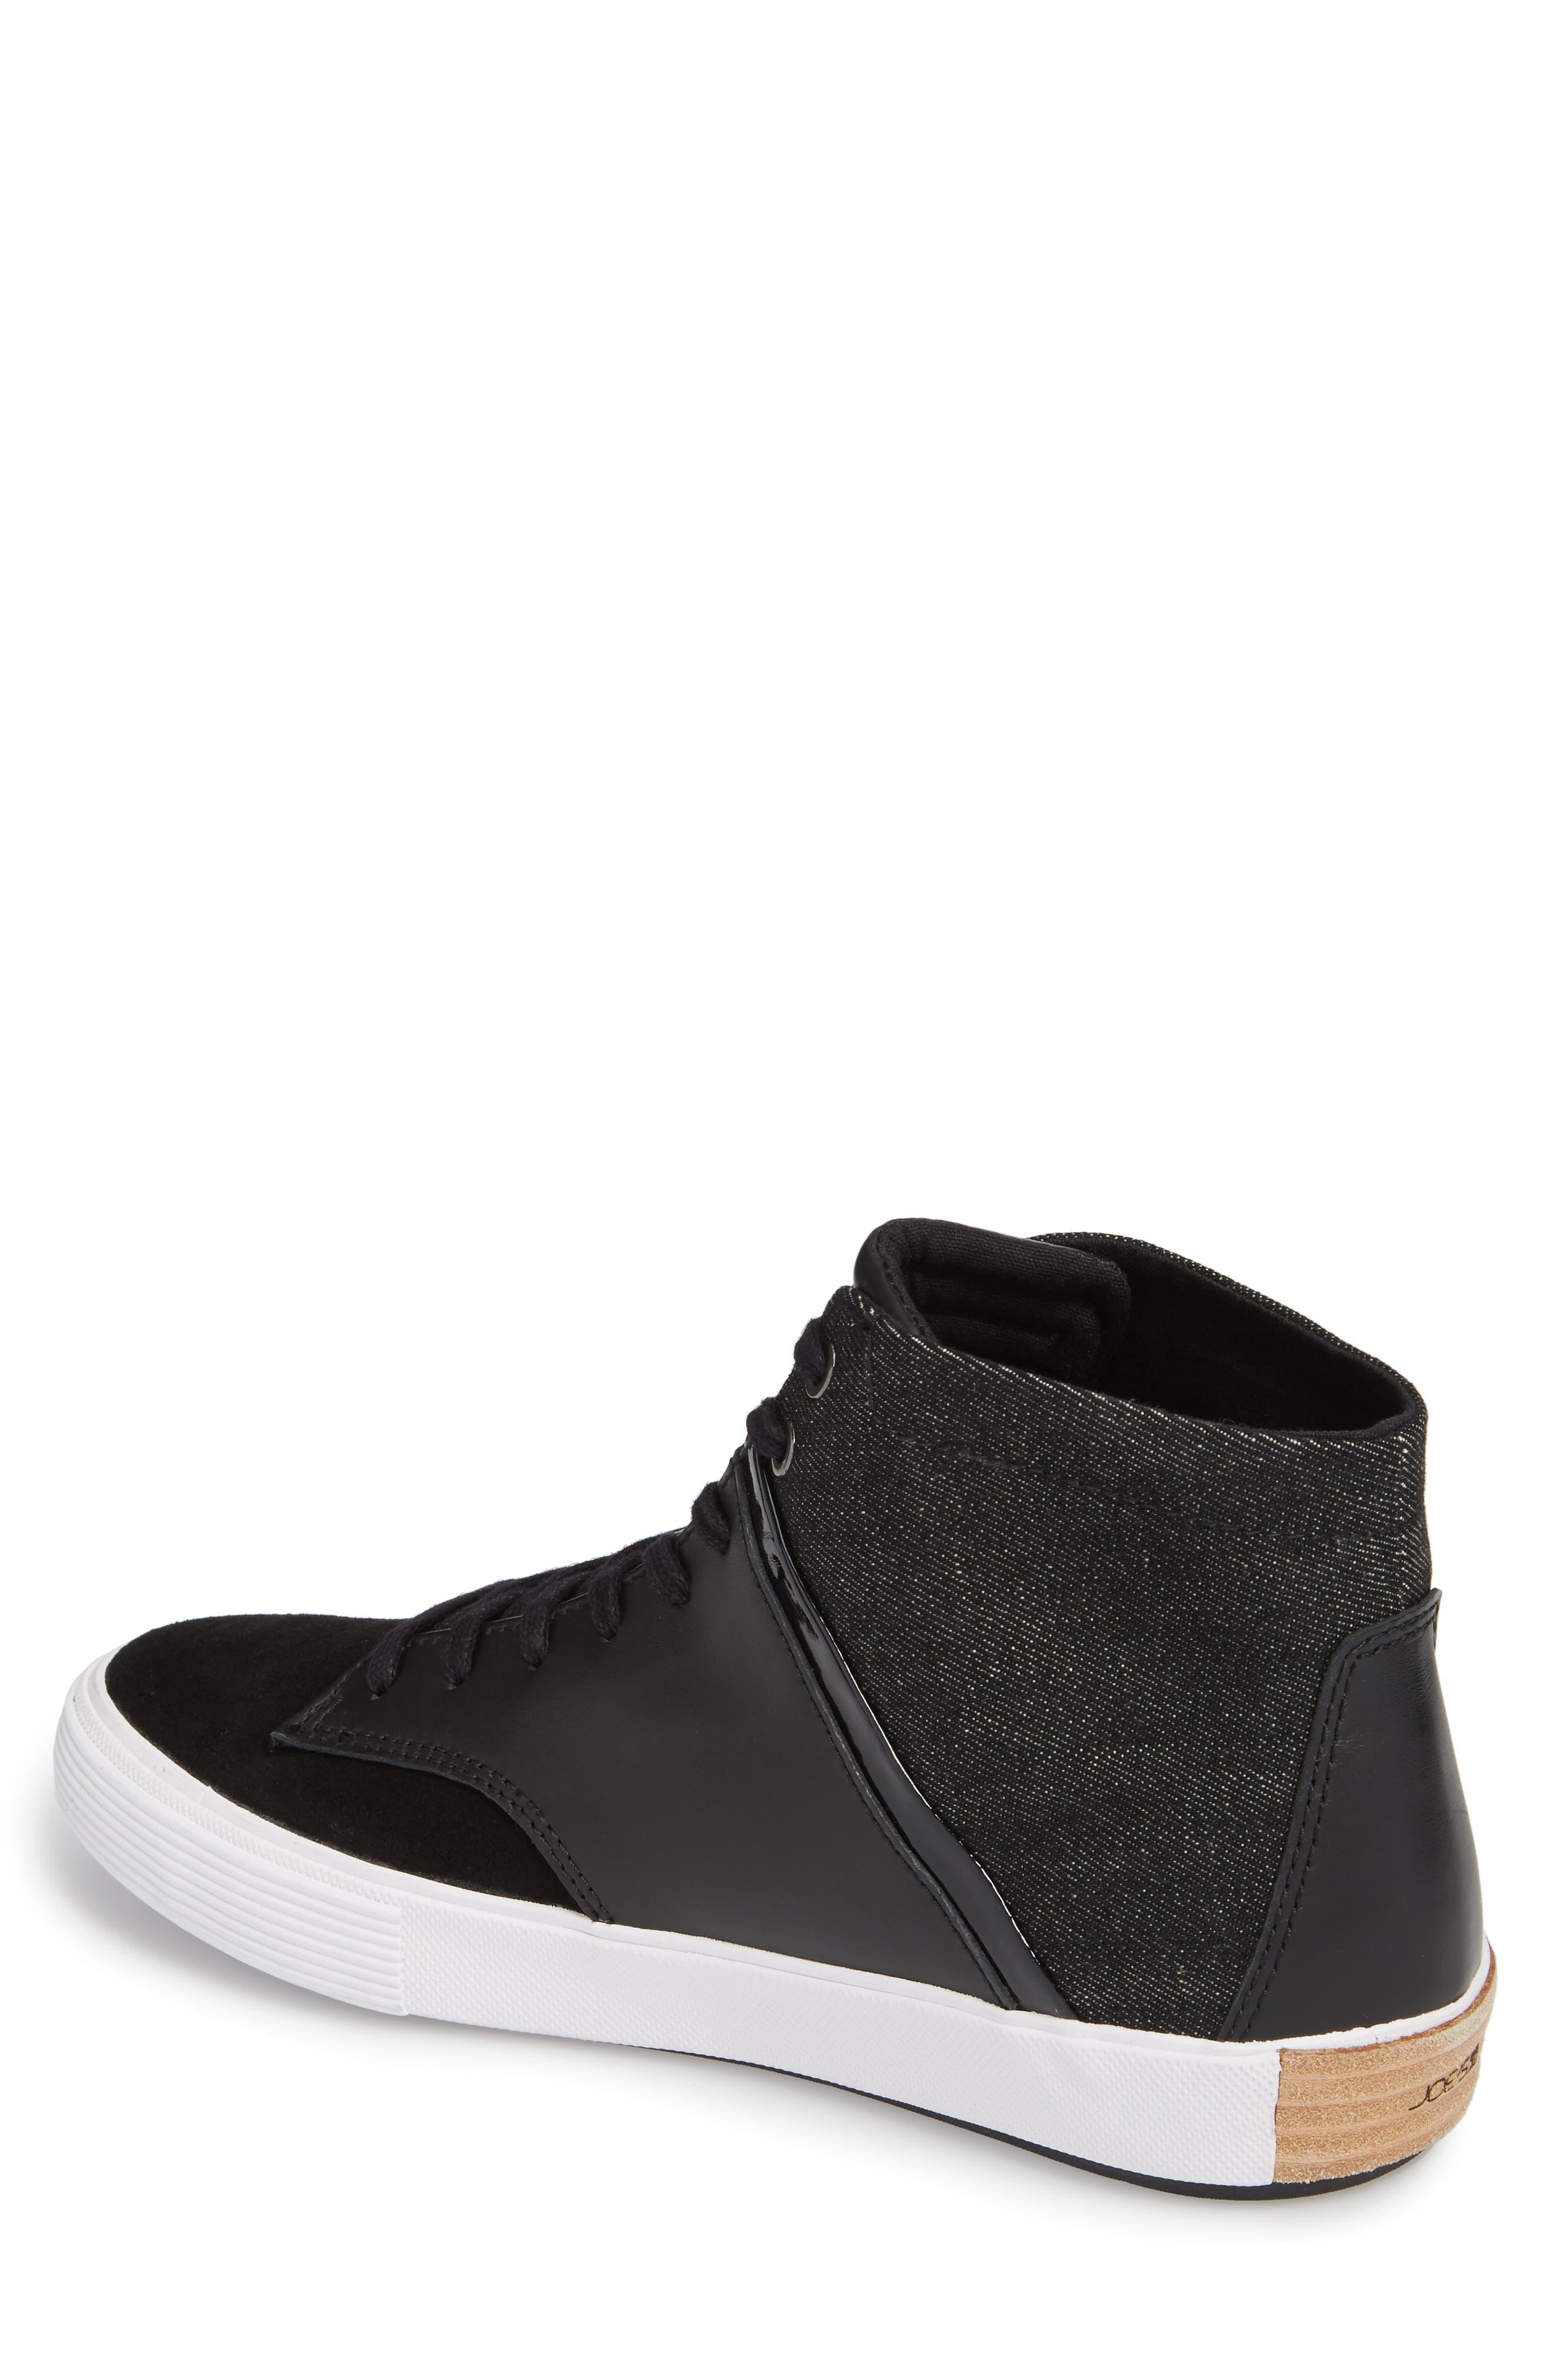 Joe Mac High Top Sneaker,                             Alternate thumbnail 2, color,                             001